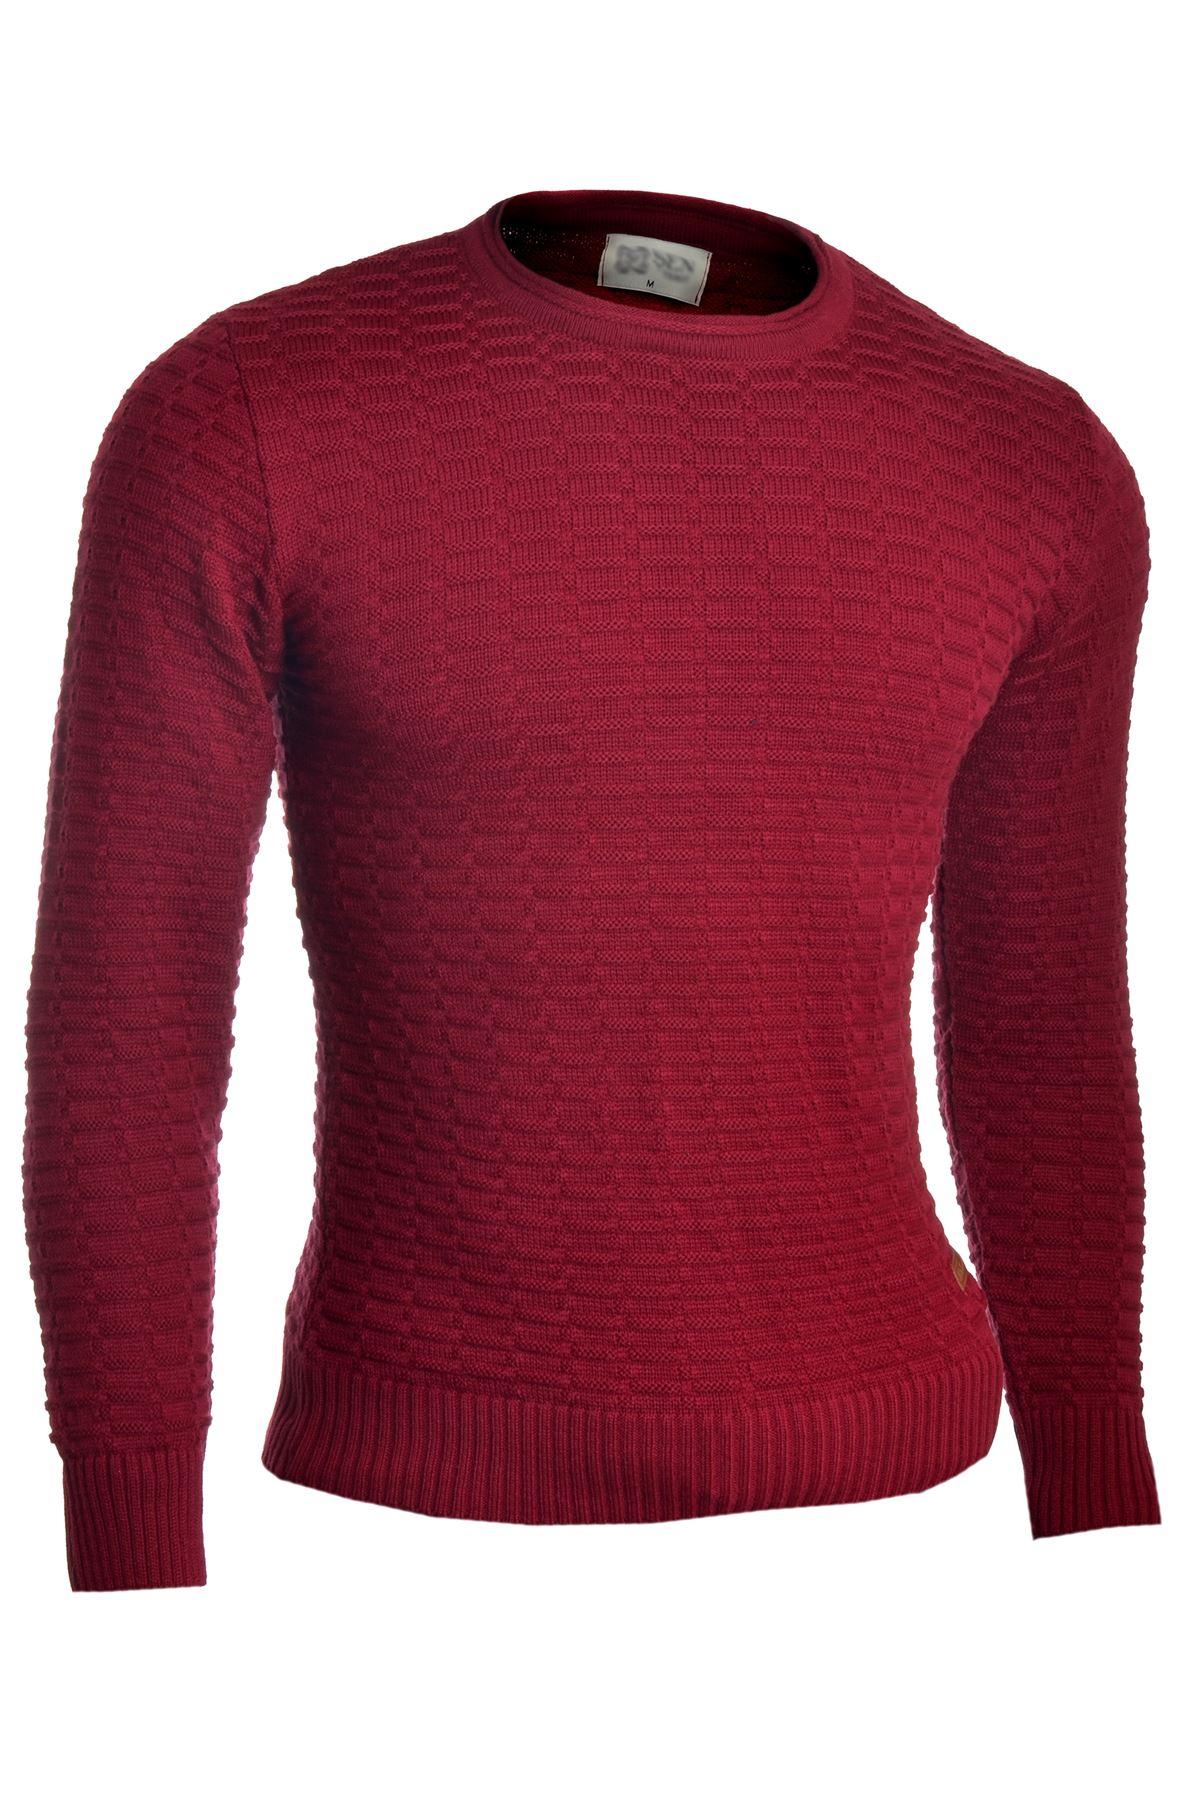 Men-039-s-Jumper-Striped-Knit-Smart-Long-Sleeve-Sweater-Crew-Neck-Top-Slim-Fitness thumbnail 2